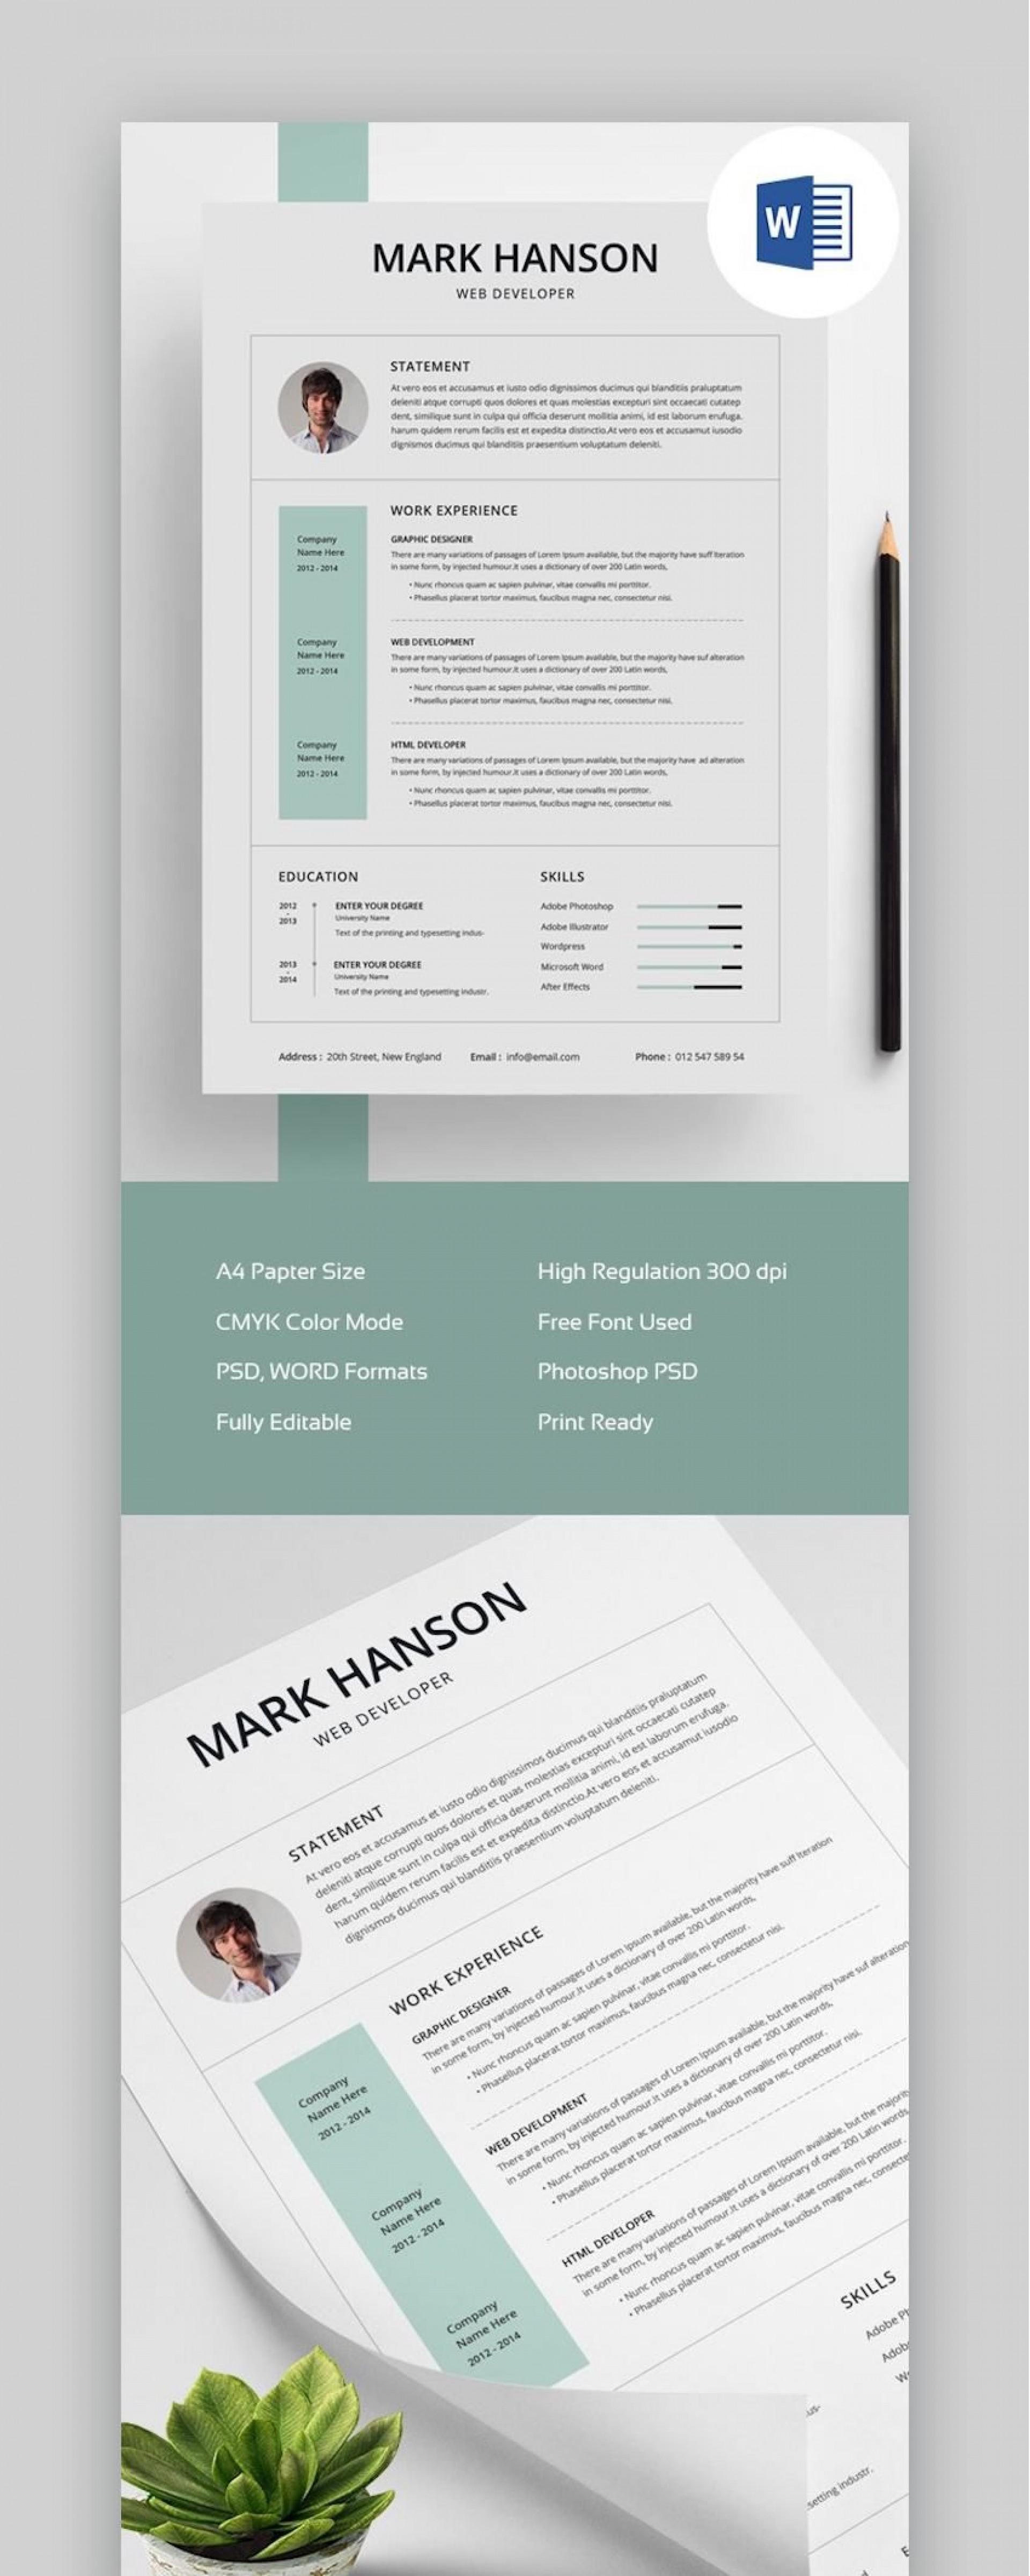 004 Impressive Adobe Photoshop Resume Template Free Design  Download1920